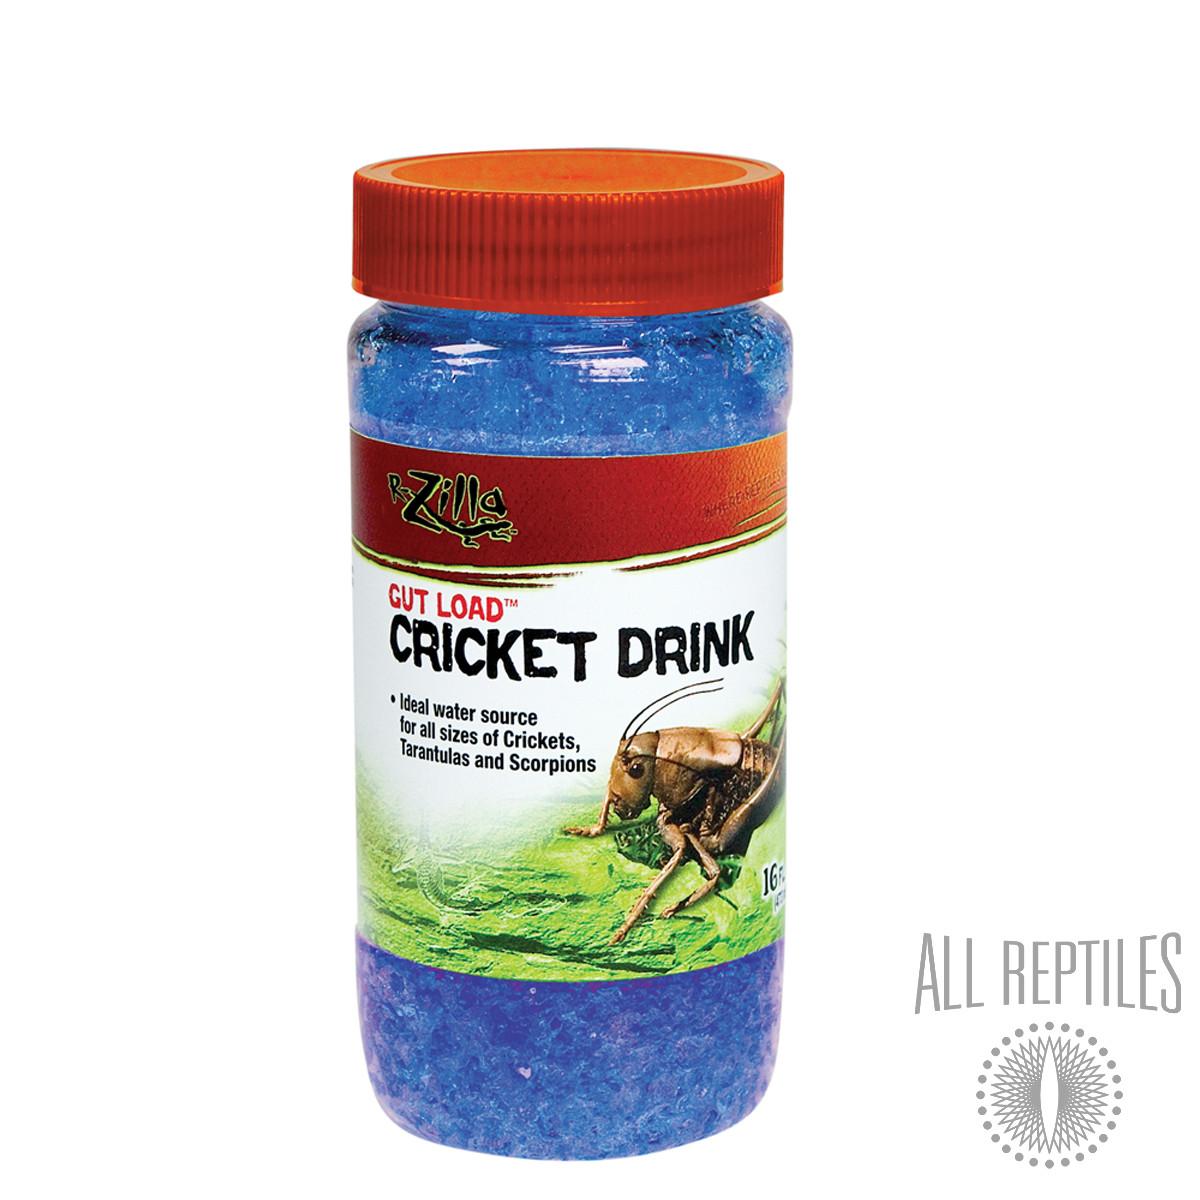 RZilla Cricket Drink Gut Load